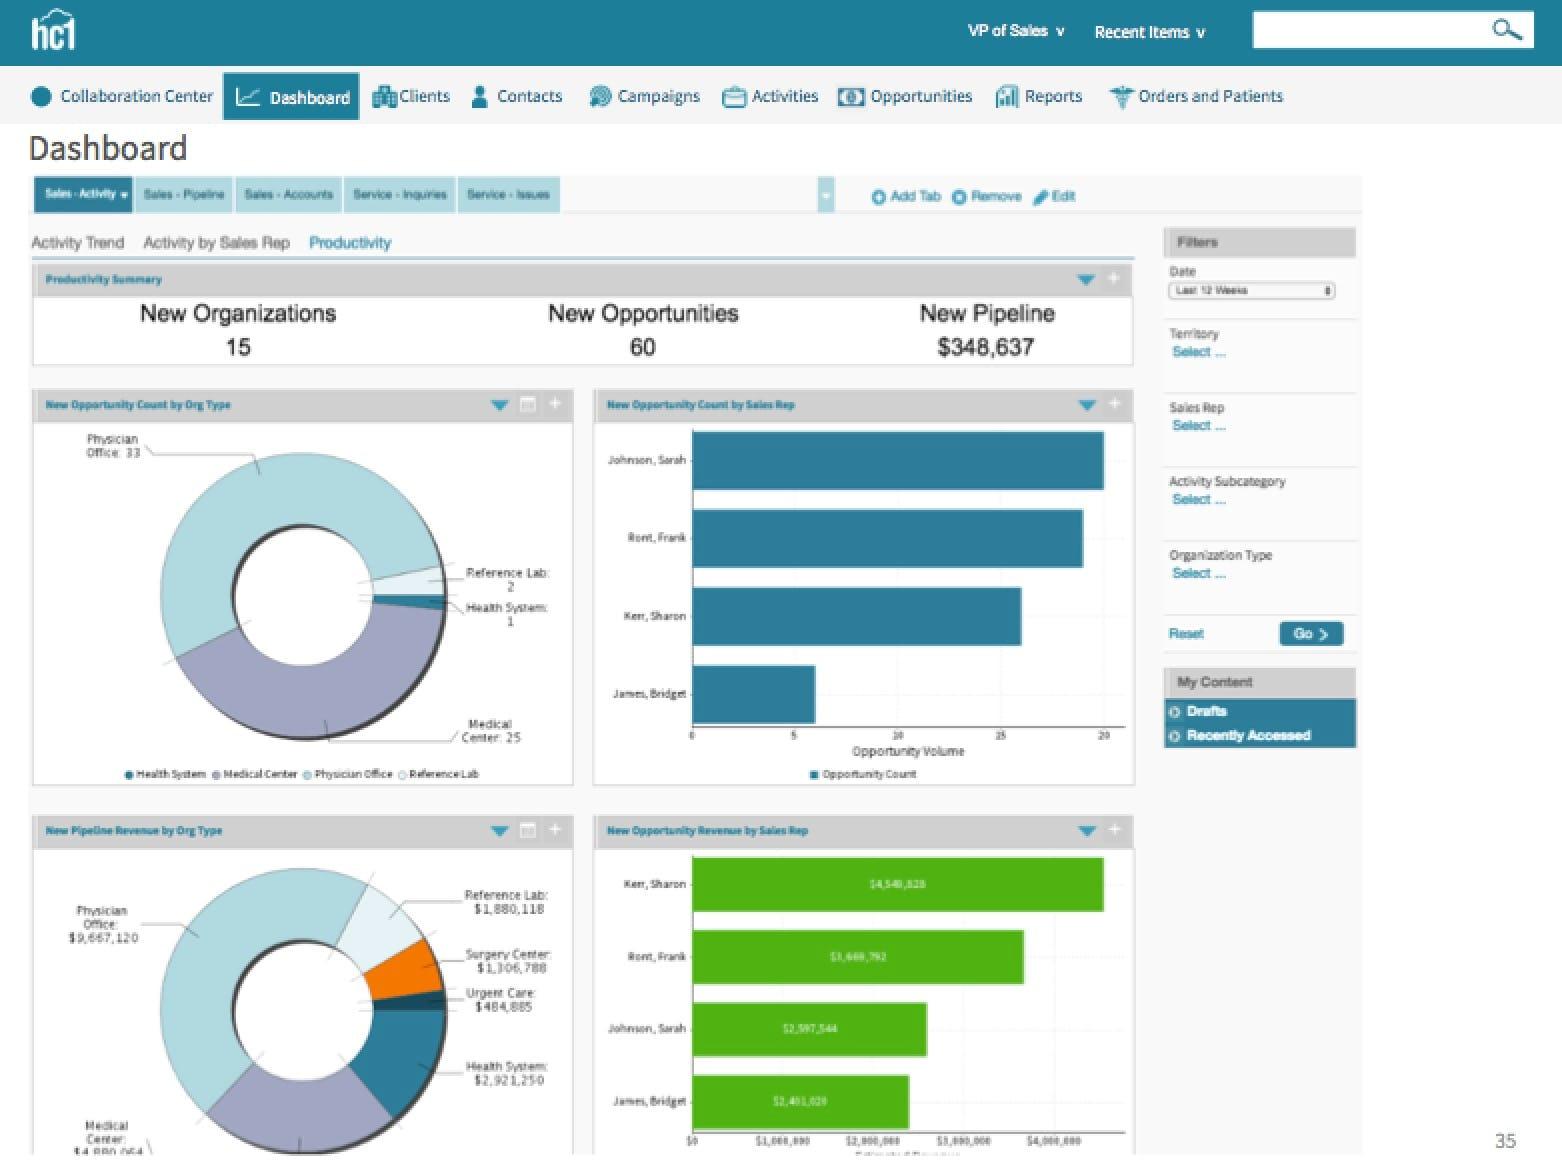 hc1 High-Value Care Platform Software - Sales account - productivity dashboard %>